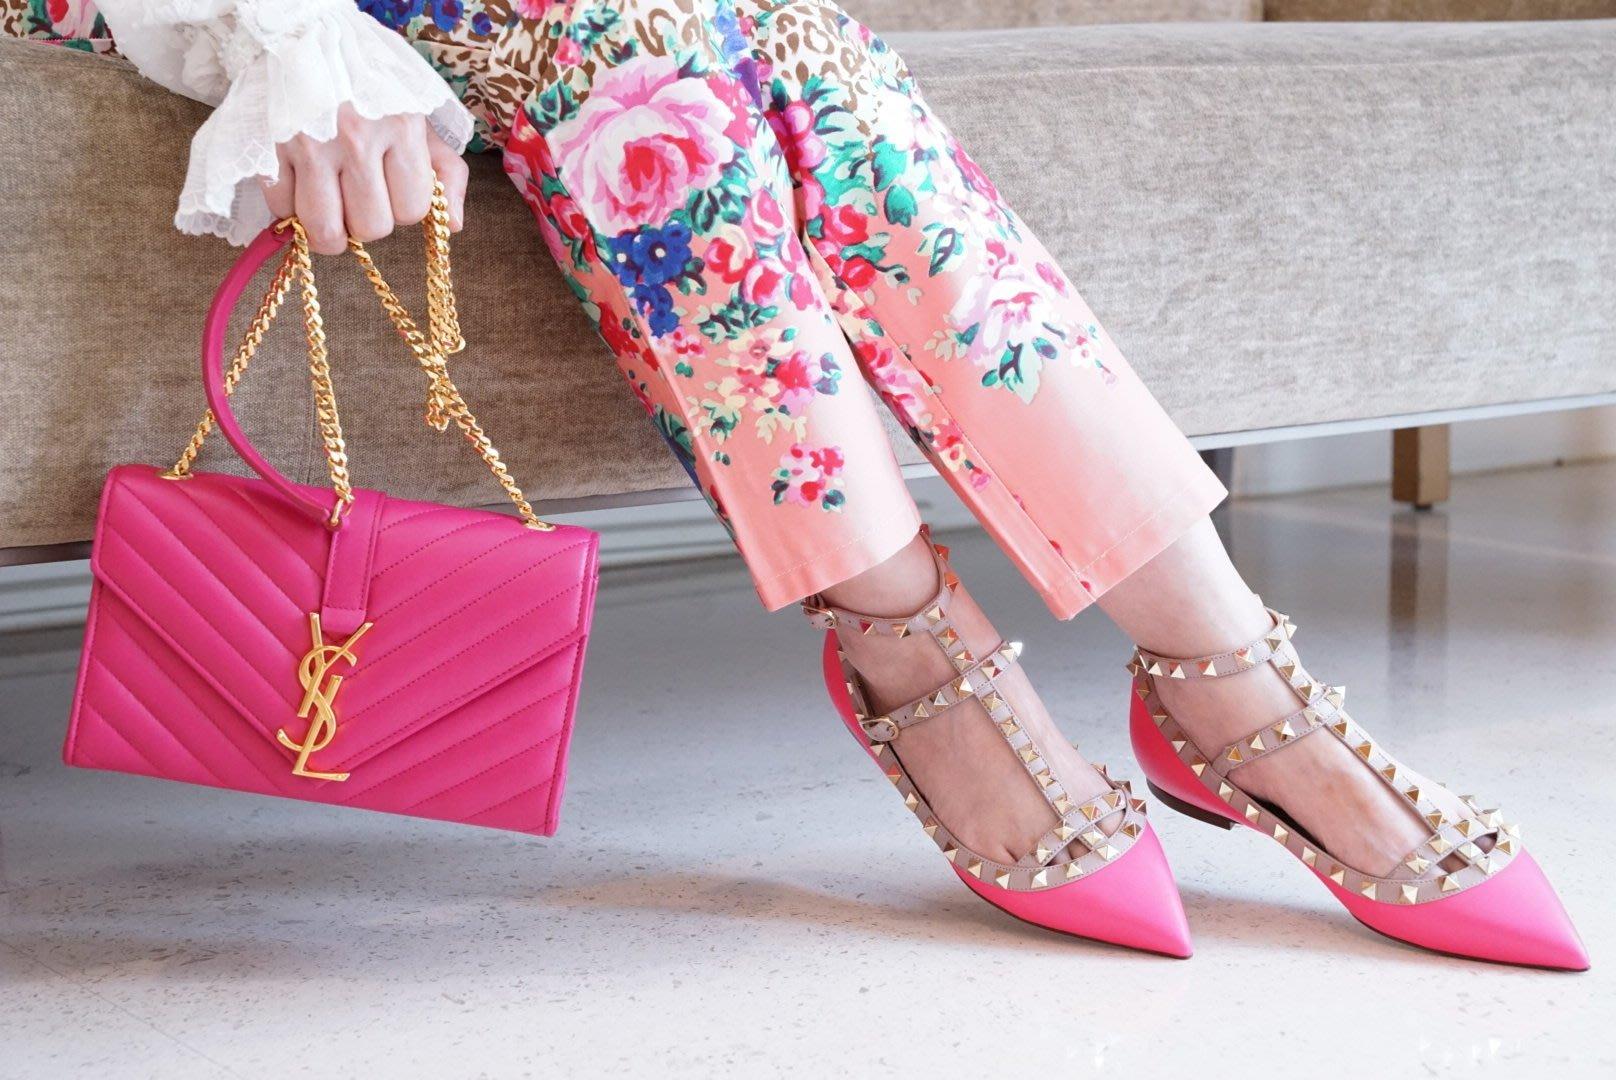 Valentino 汎倫鐵諾 Rockstud ballerinas 龐克卯釘牛皮 低跟鞋 螢光粉 36.5 現貨